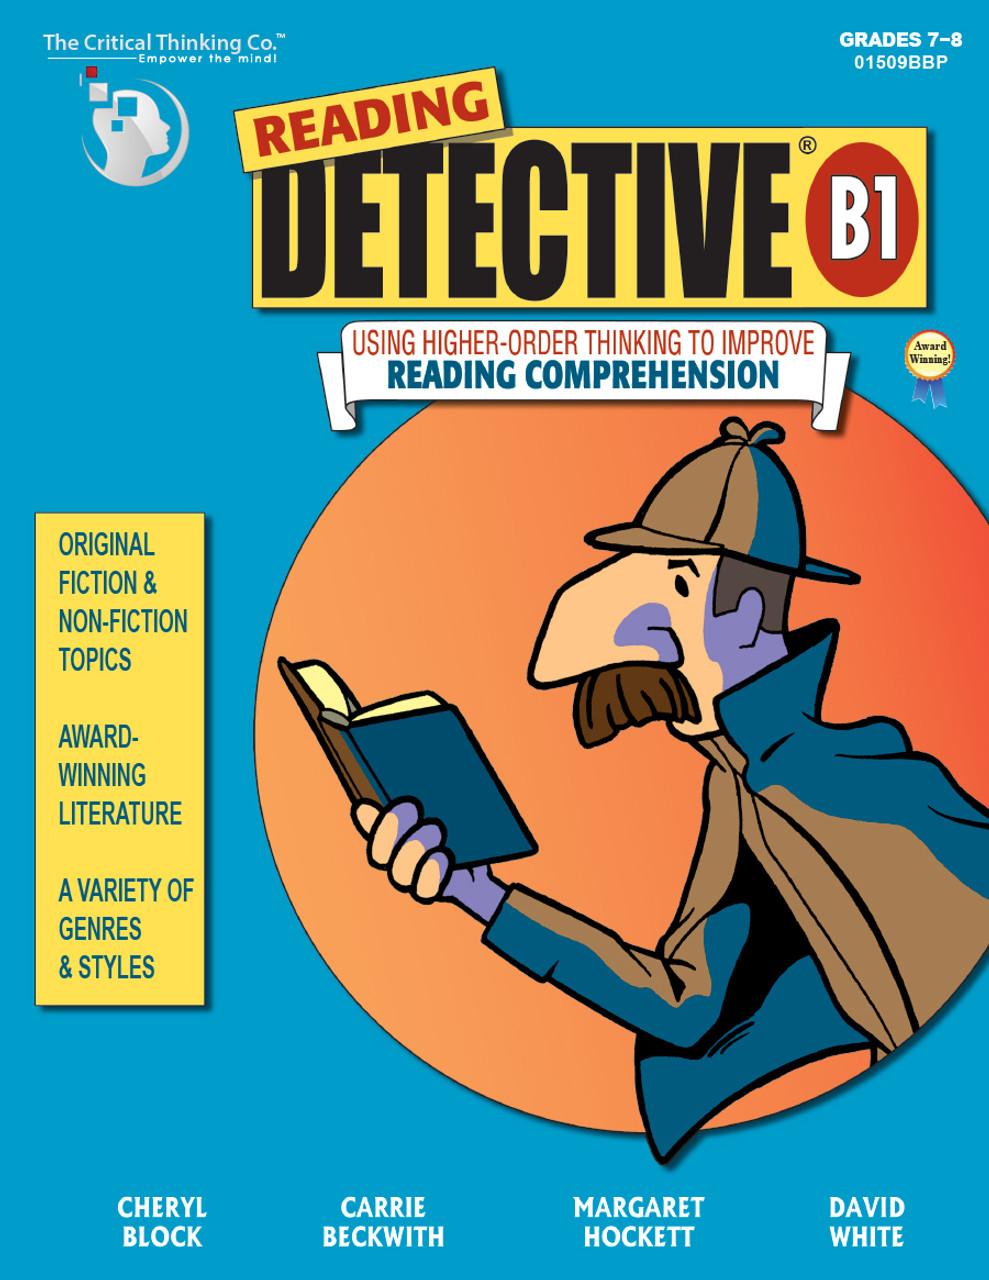 Reading Detective B1-Grades 7-8